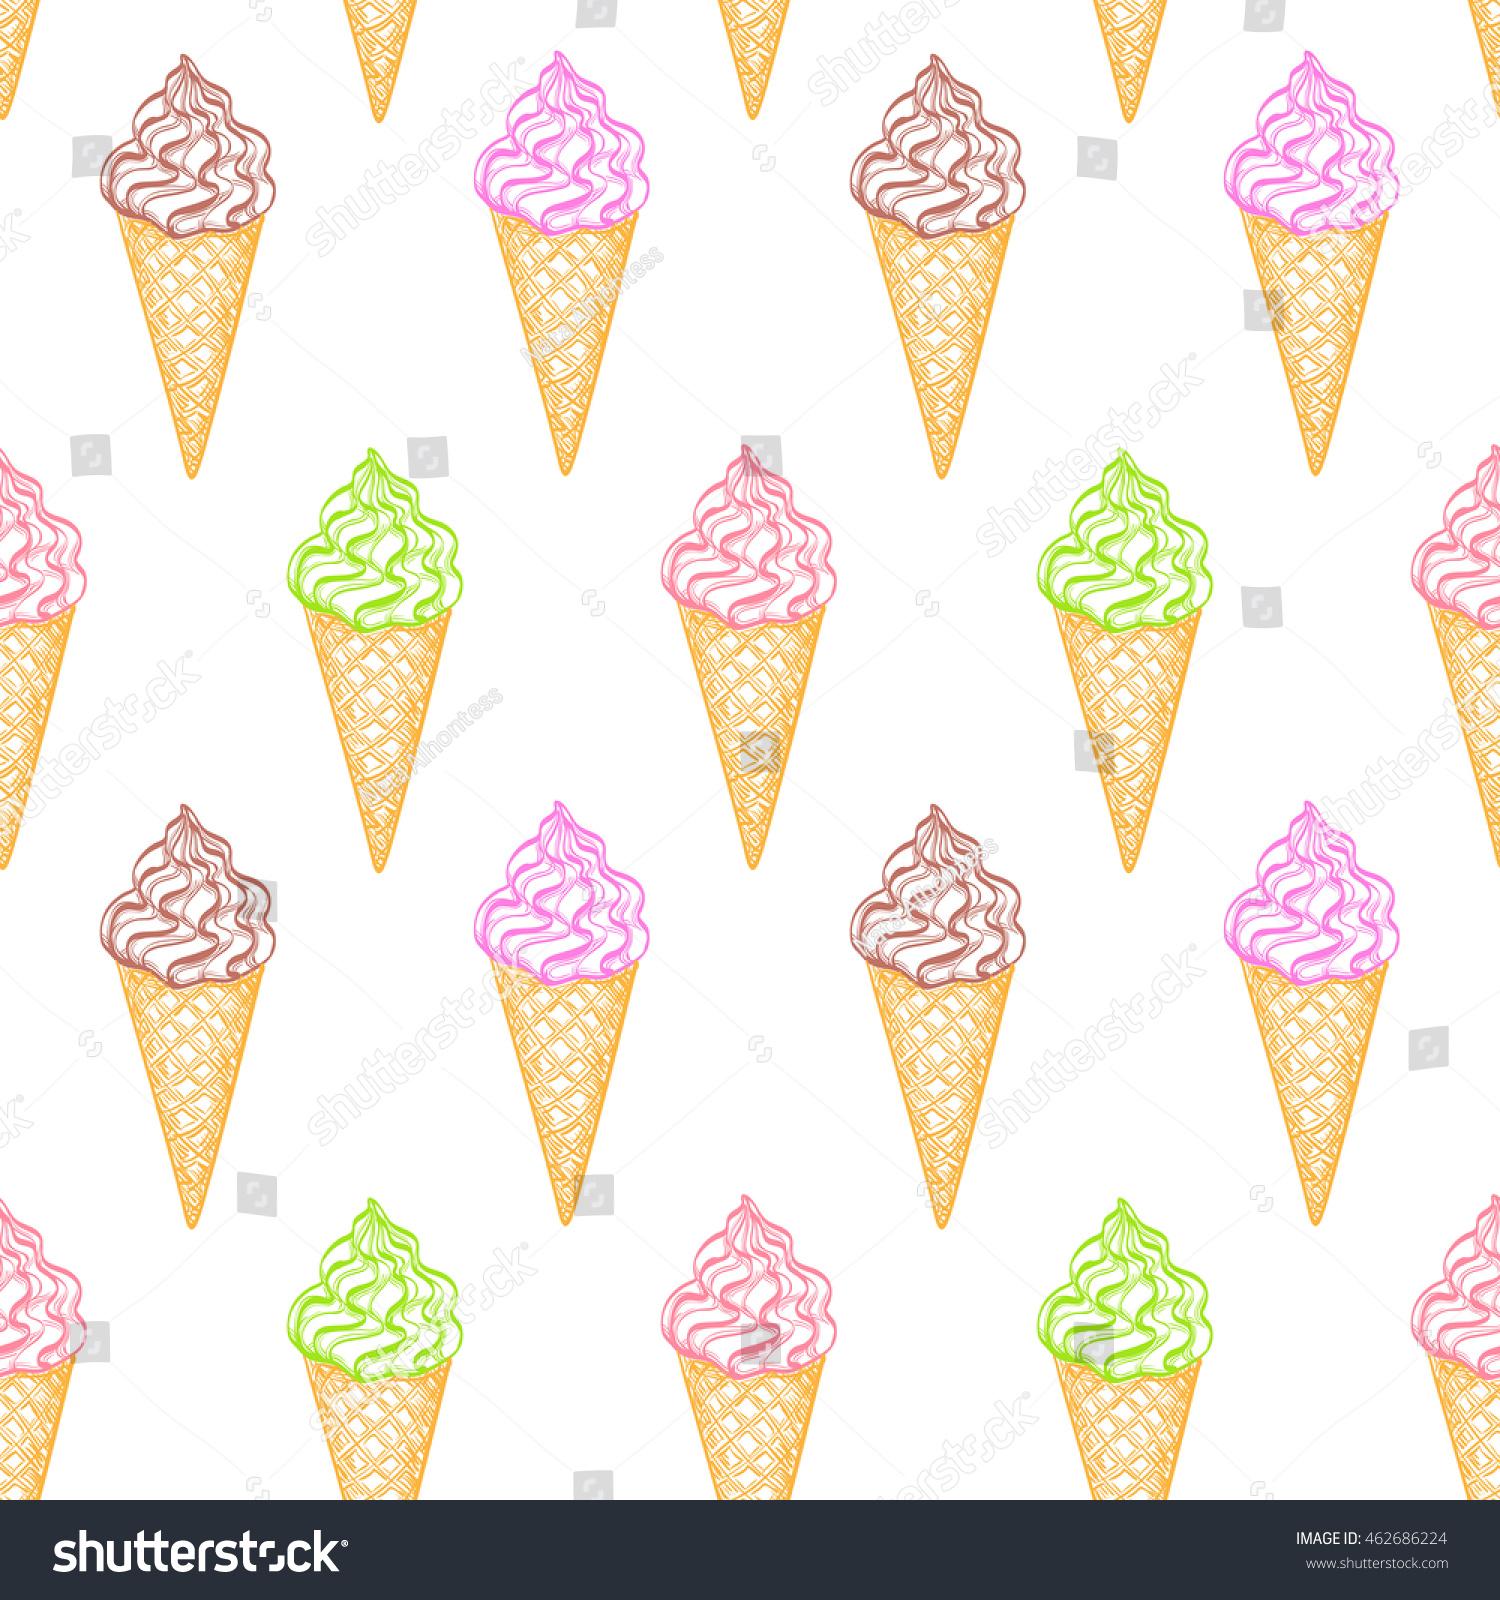 Ice Cream Cones Seamless Pattern Background Stock Vector: Seamless Pattern Ice Cream Cones Hand Stock Vector